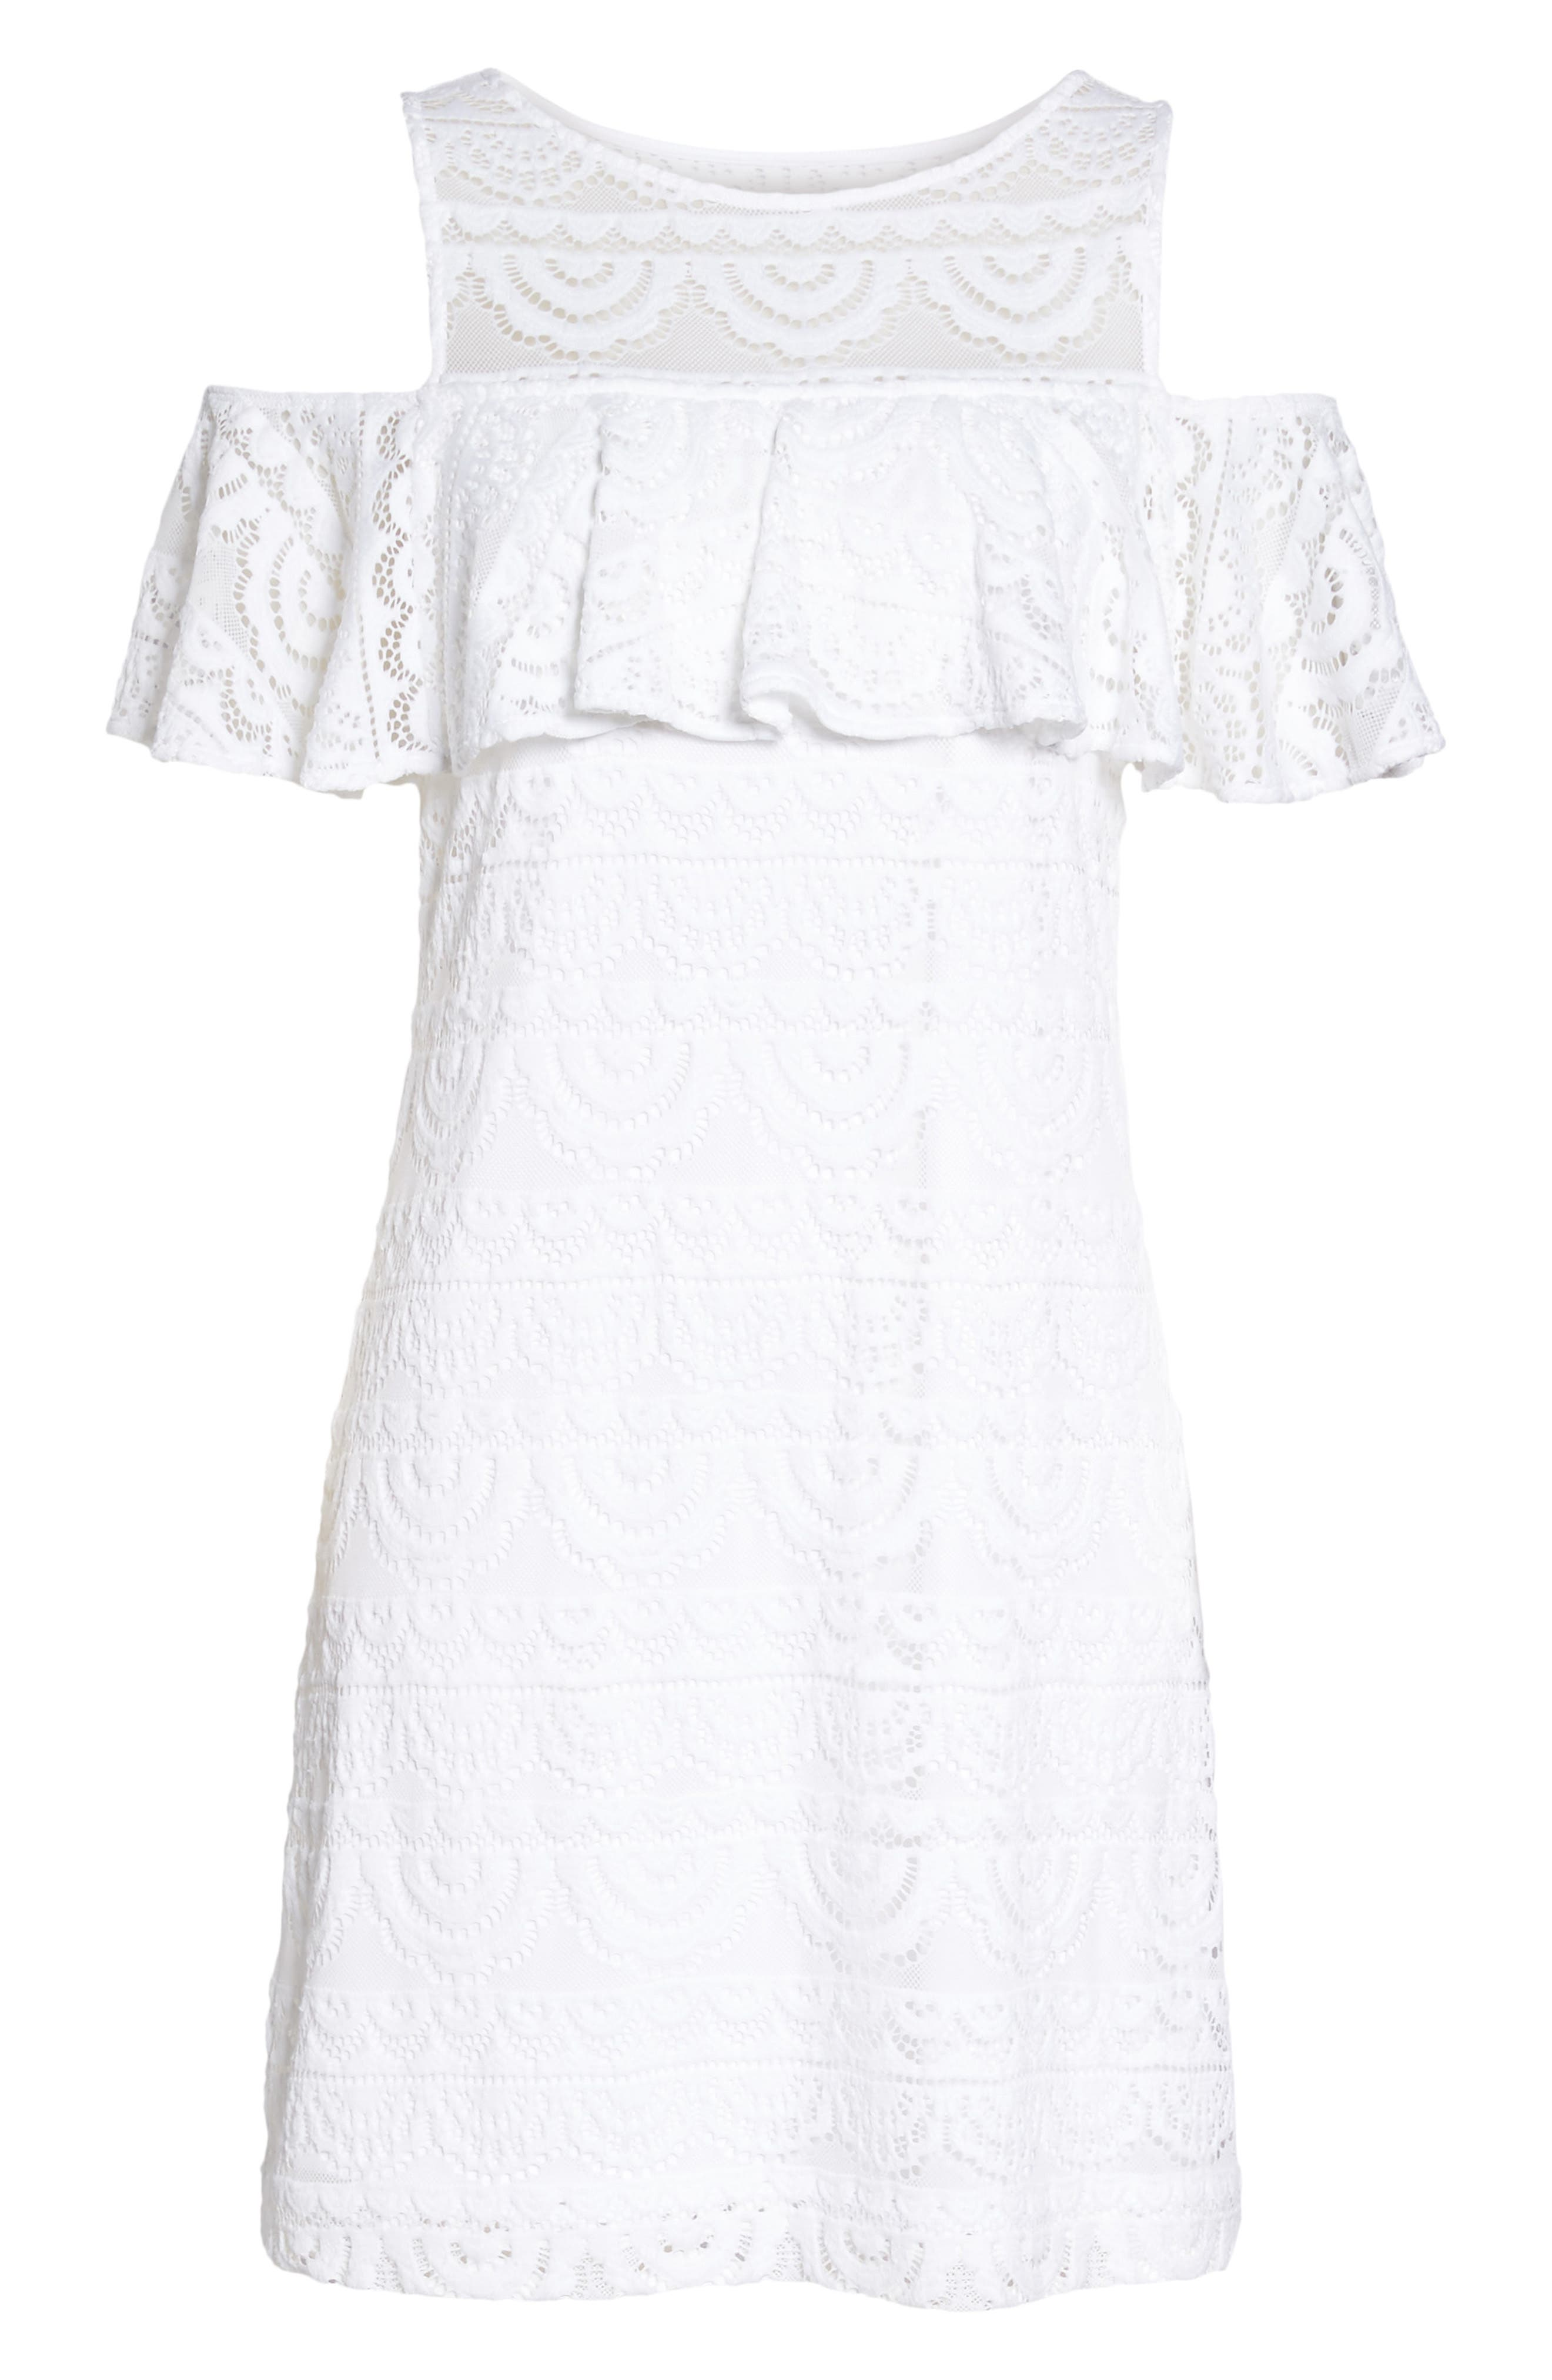 Lyra Cold Shoulder Lace Dress,                             Alternate thumbnail 6, color,                             Resort White Scallop Lace